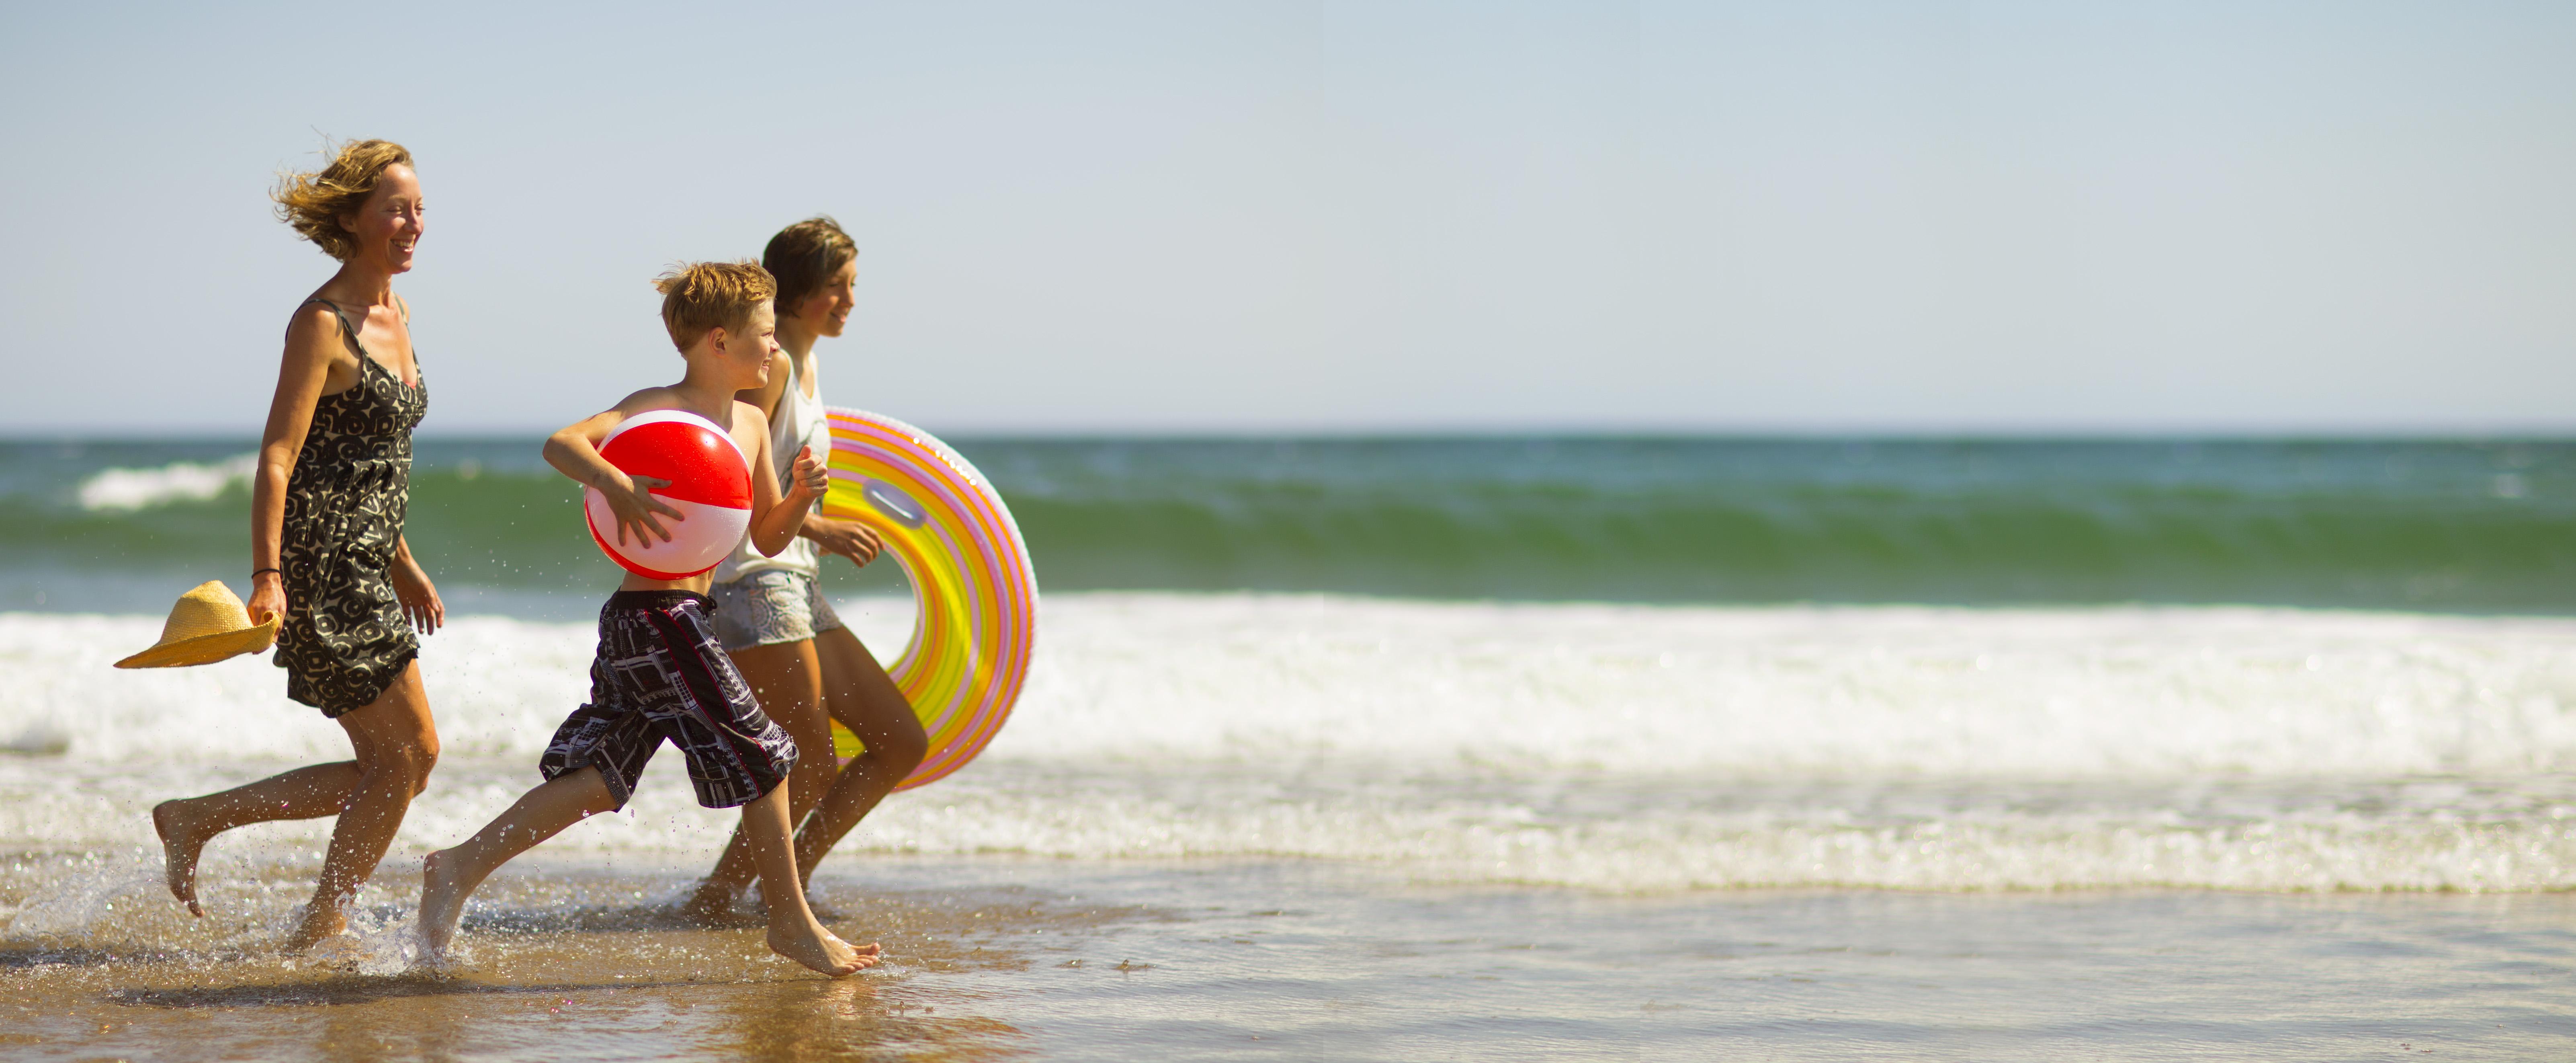 family_running_on_beach